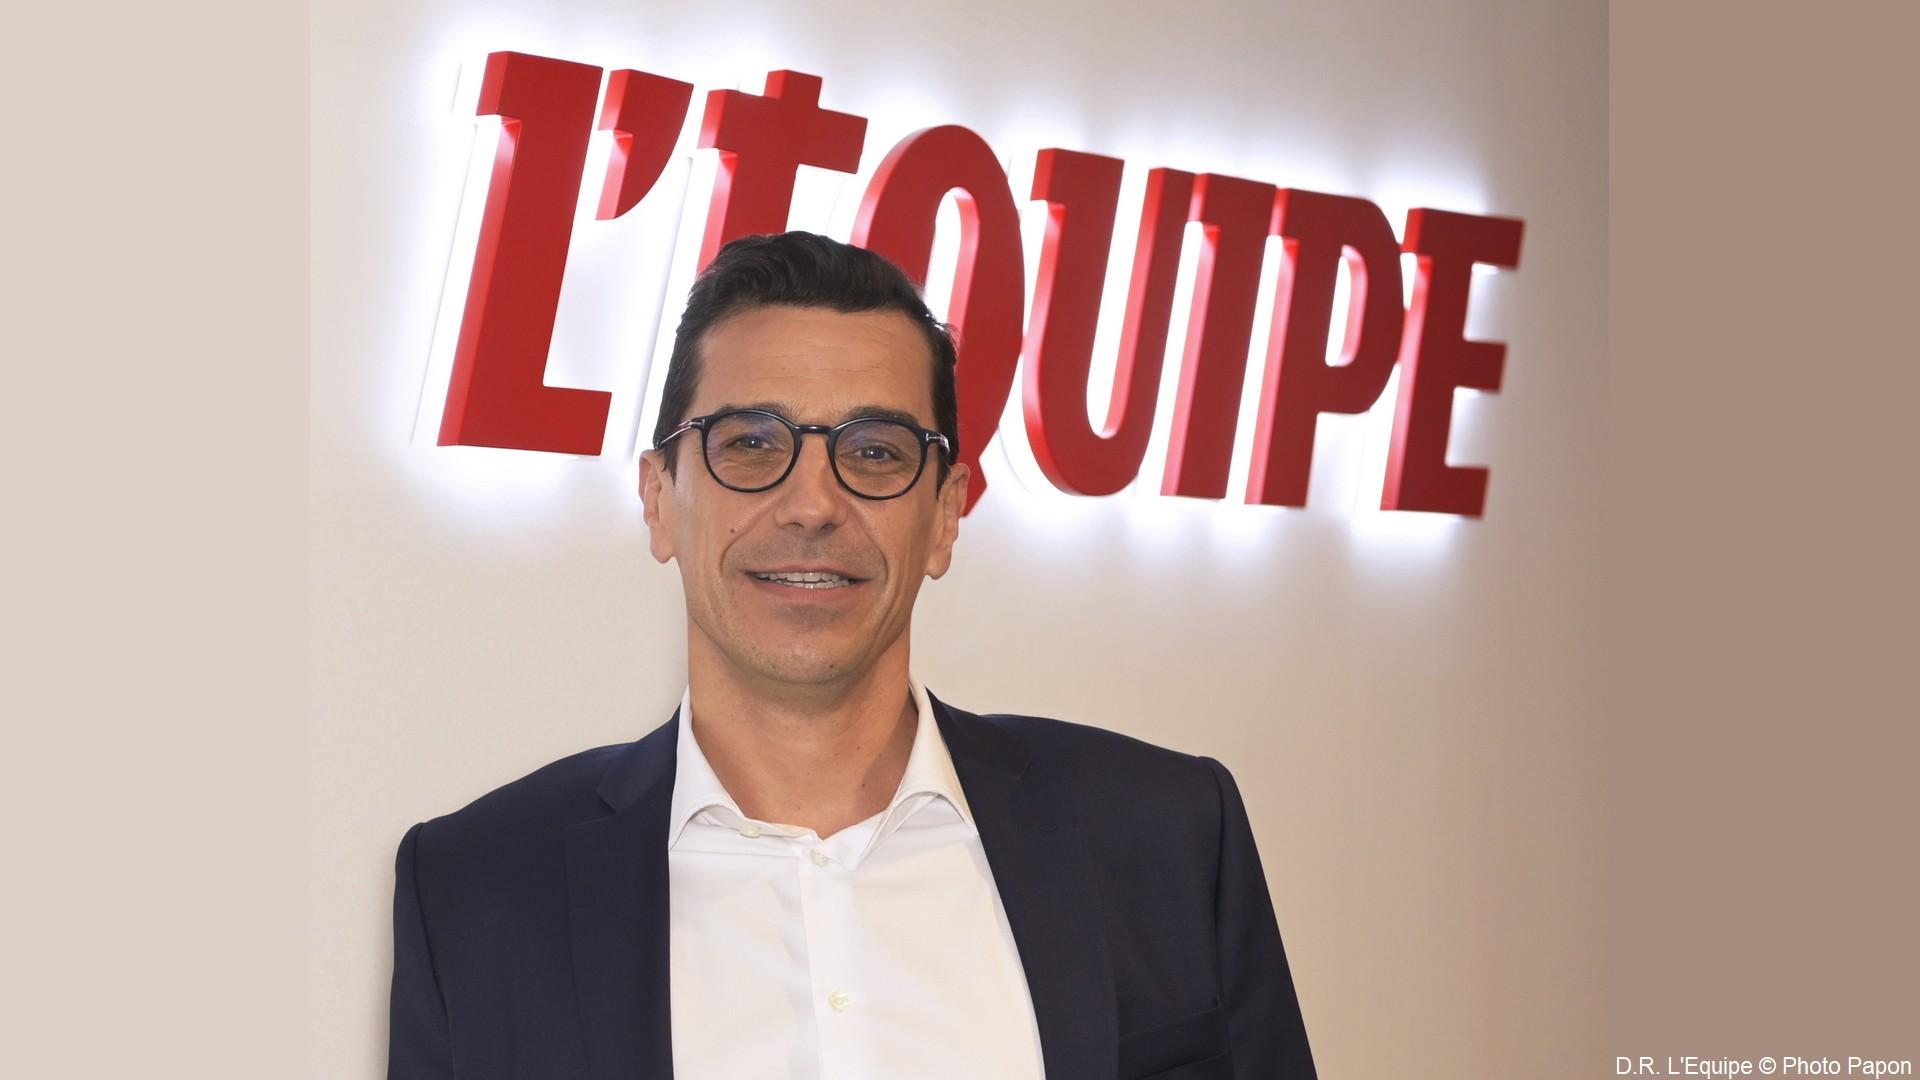 Prudhomme Laurent (3) L'Equipe